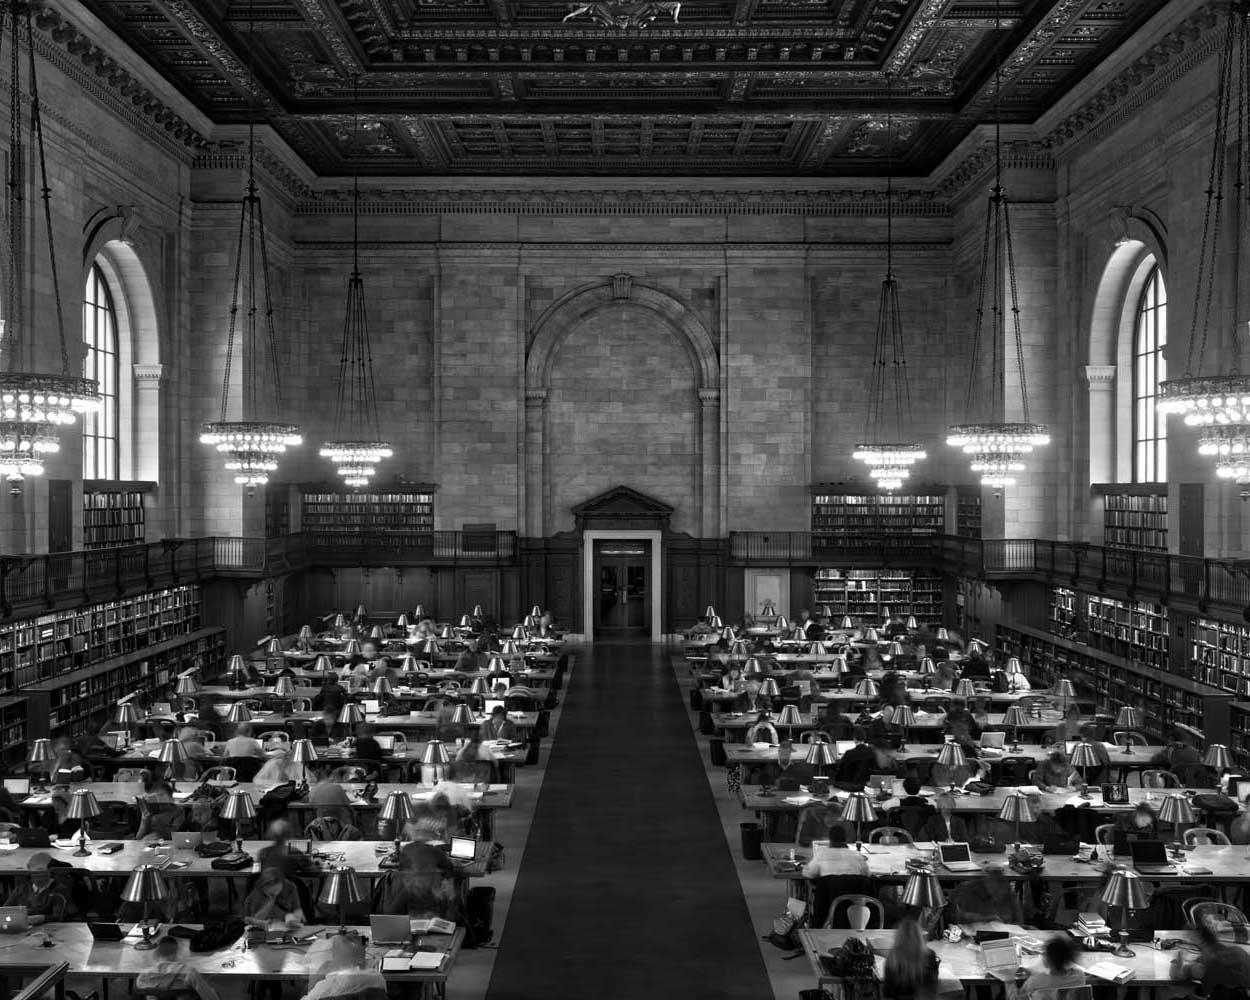 Main Reading Room, New York Public Library